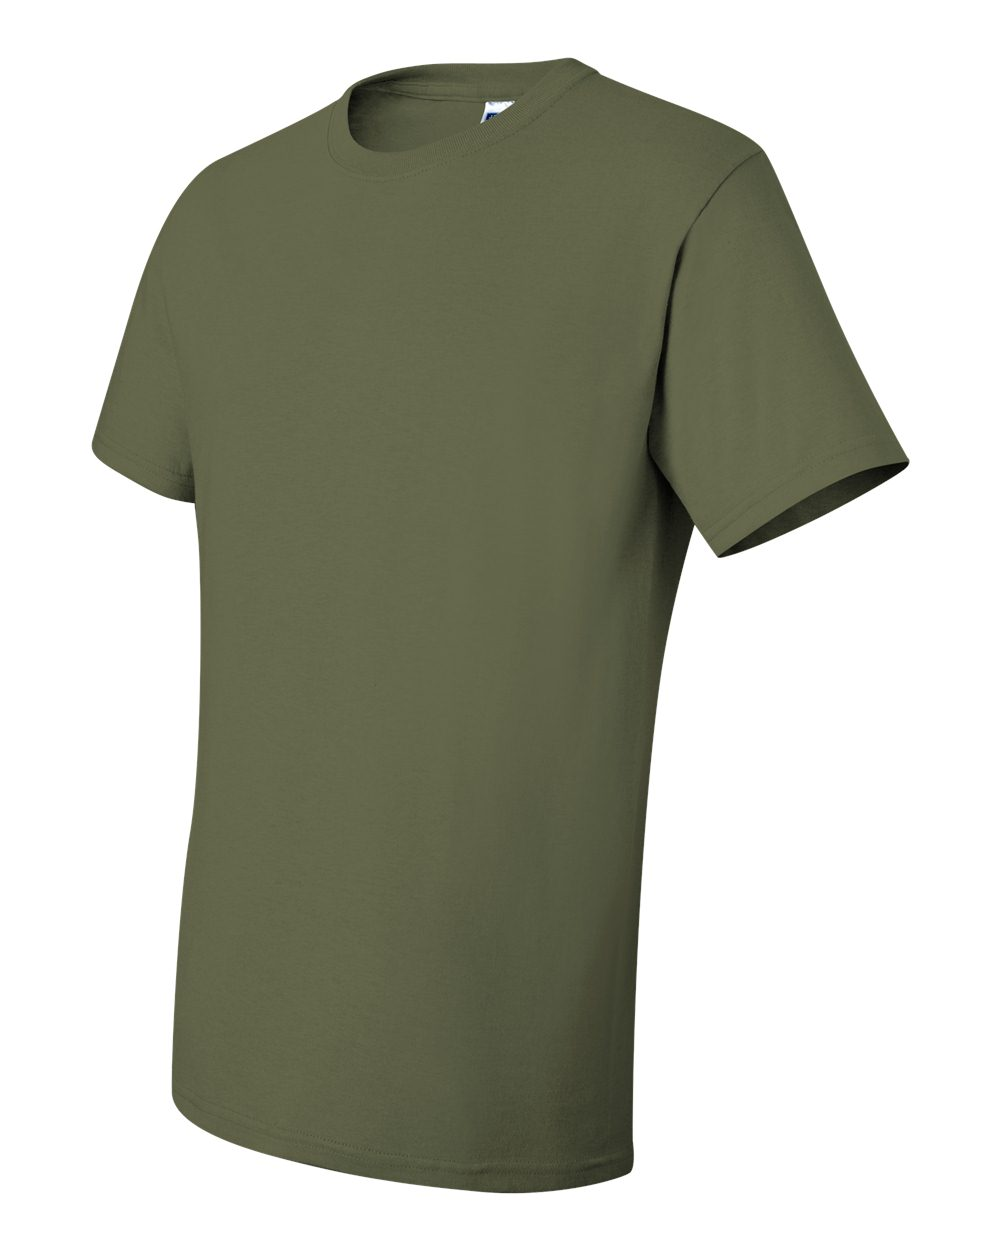 5050-militarygreen.jpg